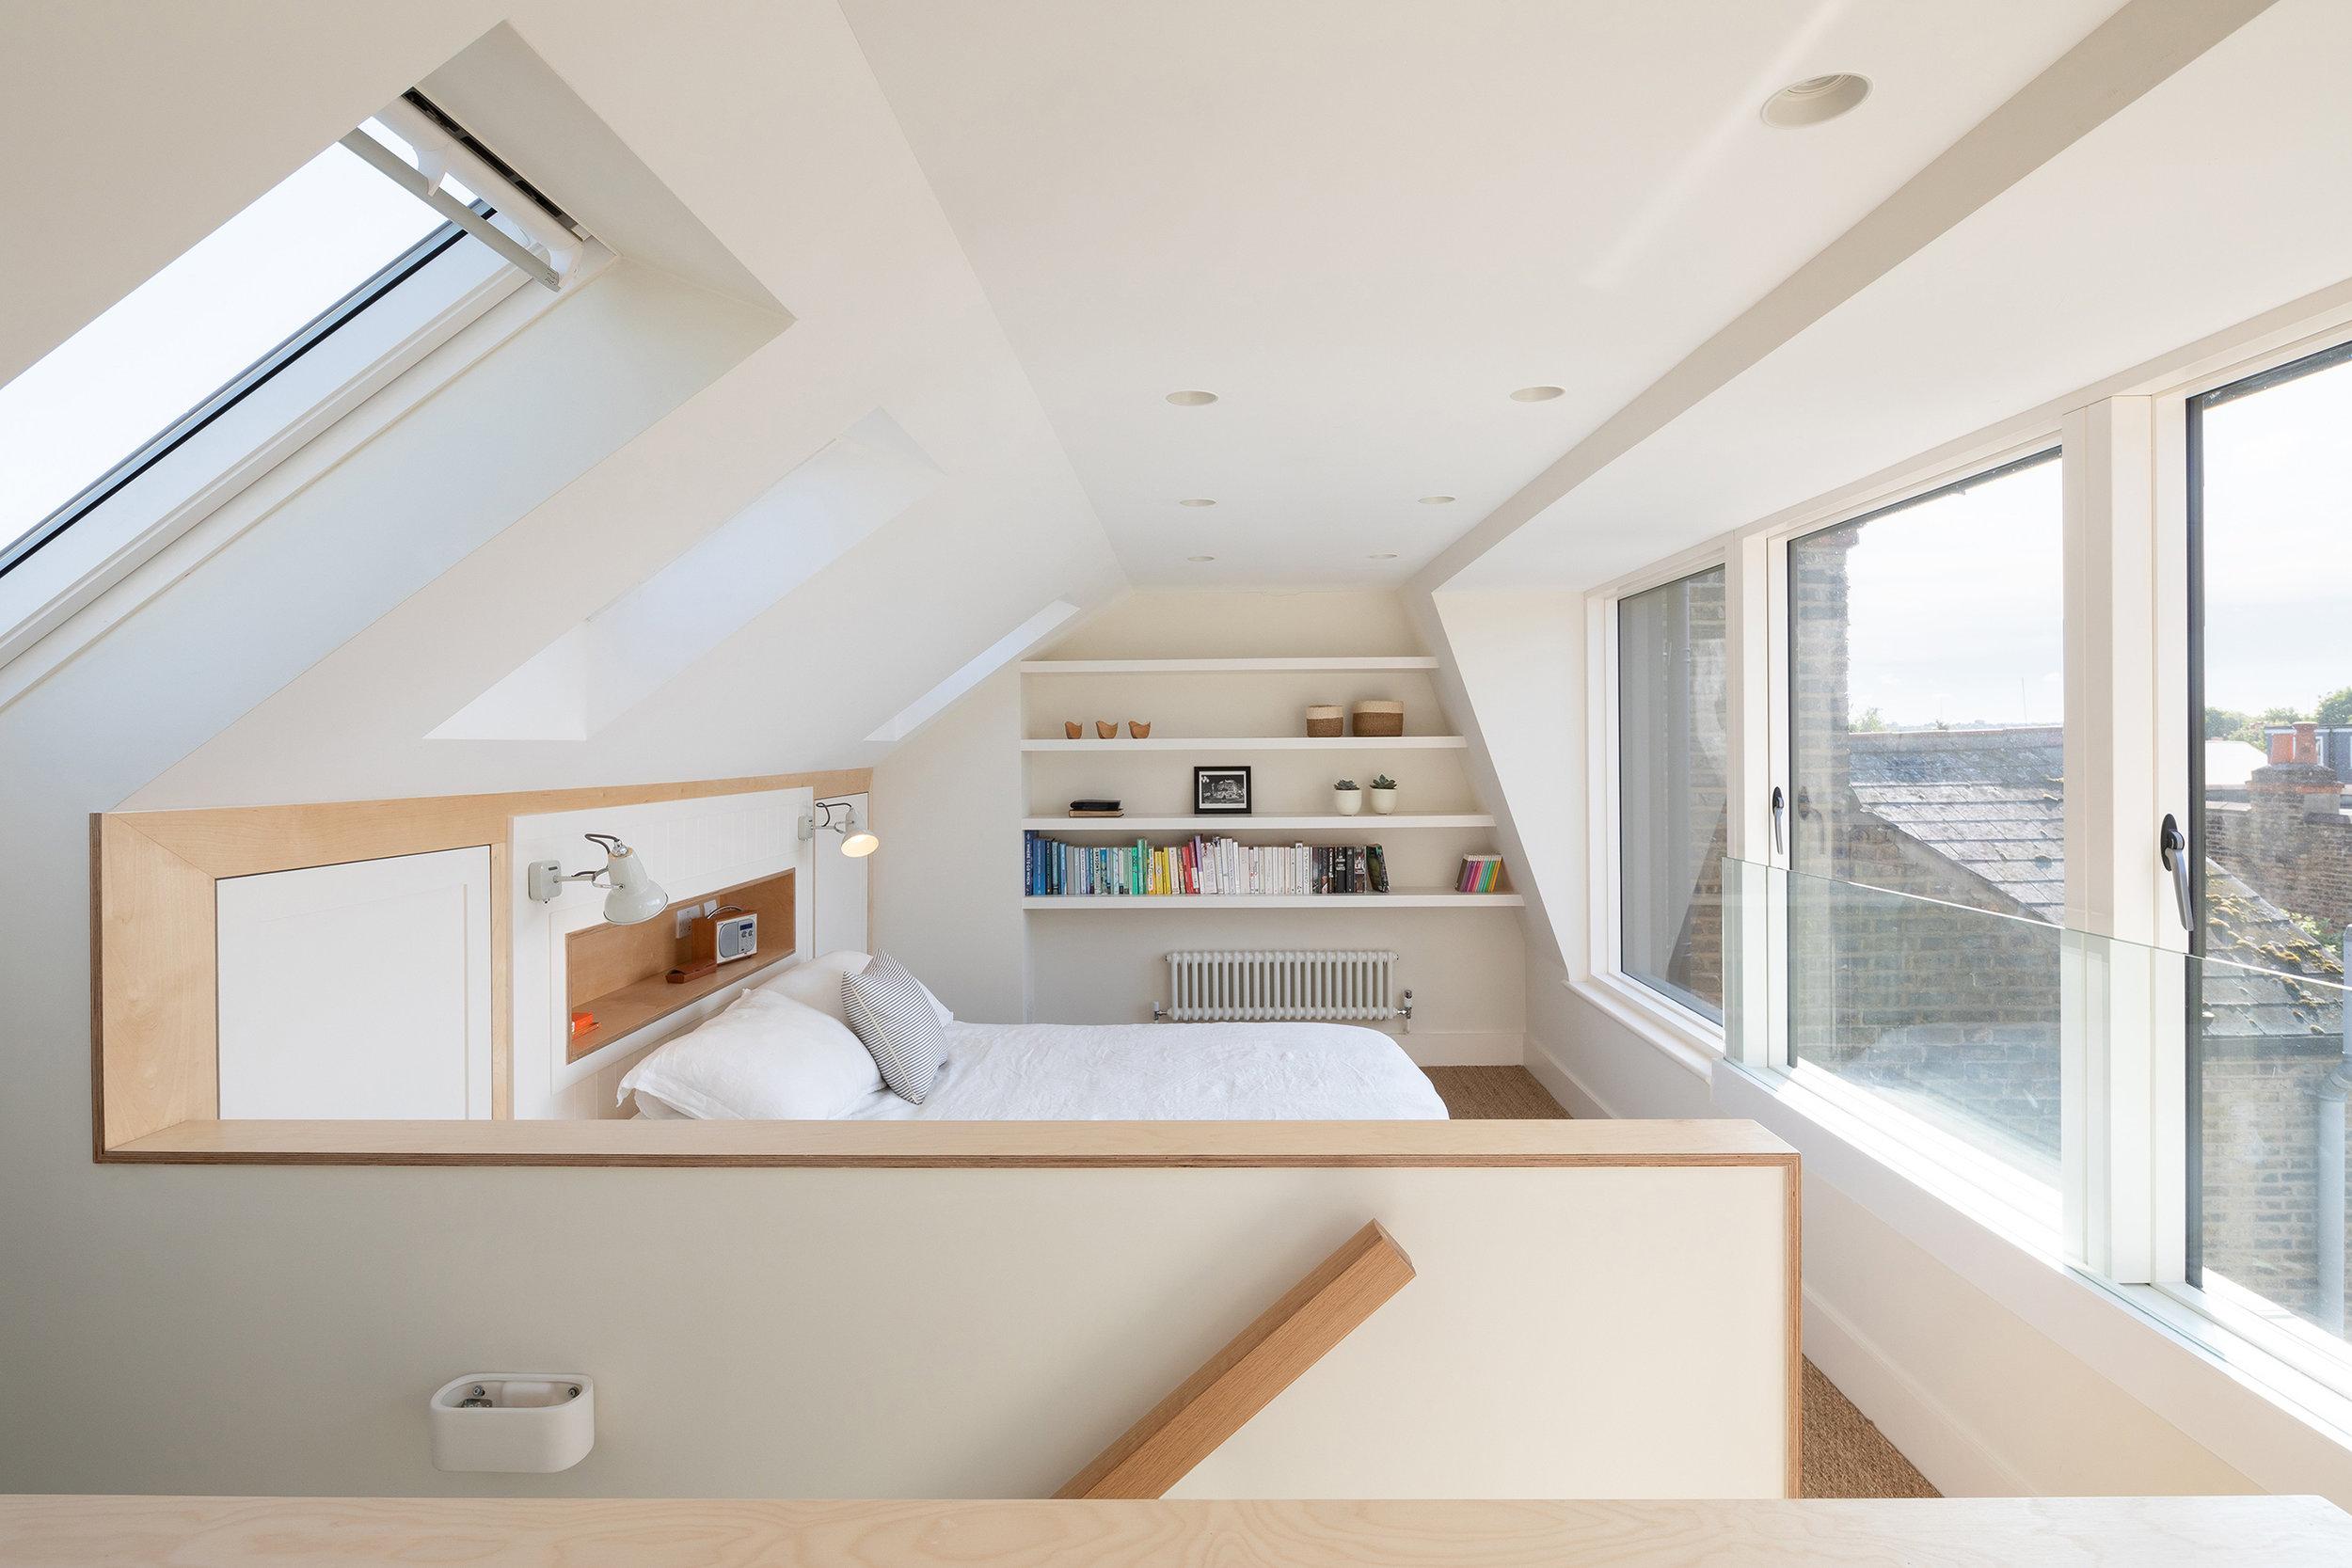 04-smeaton-road-victorian-house-roof-extension-loft-conversion-site-photo-architecture-wandsworth-south-london-uk-rider-stirland-architects-adam-scott.jpg